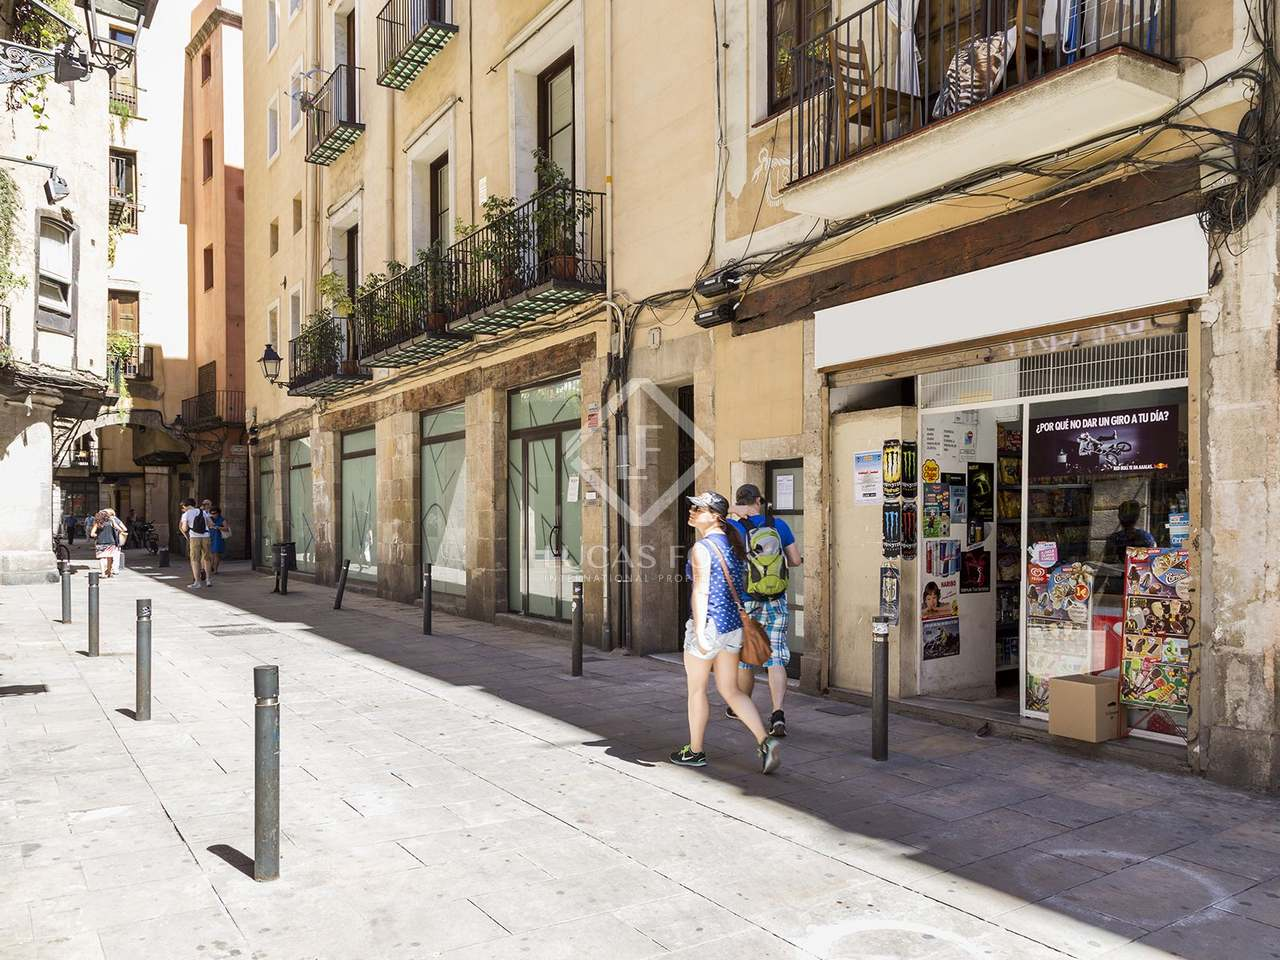 Apartamento de dise o en venta en el casco antiguo de - Casco antiguo de barcelona ...